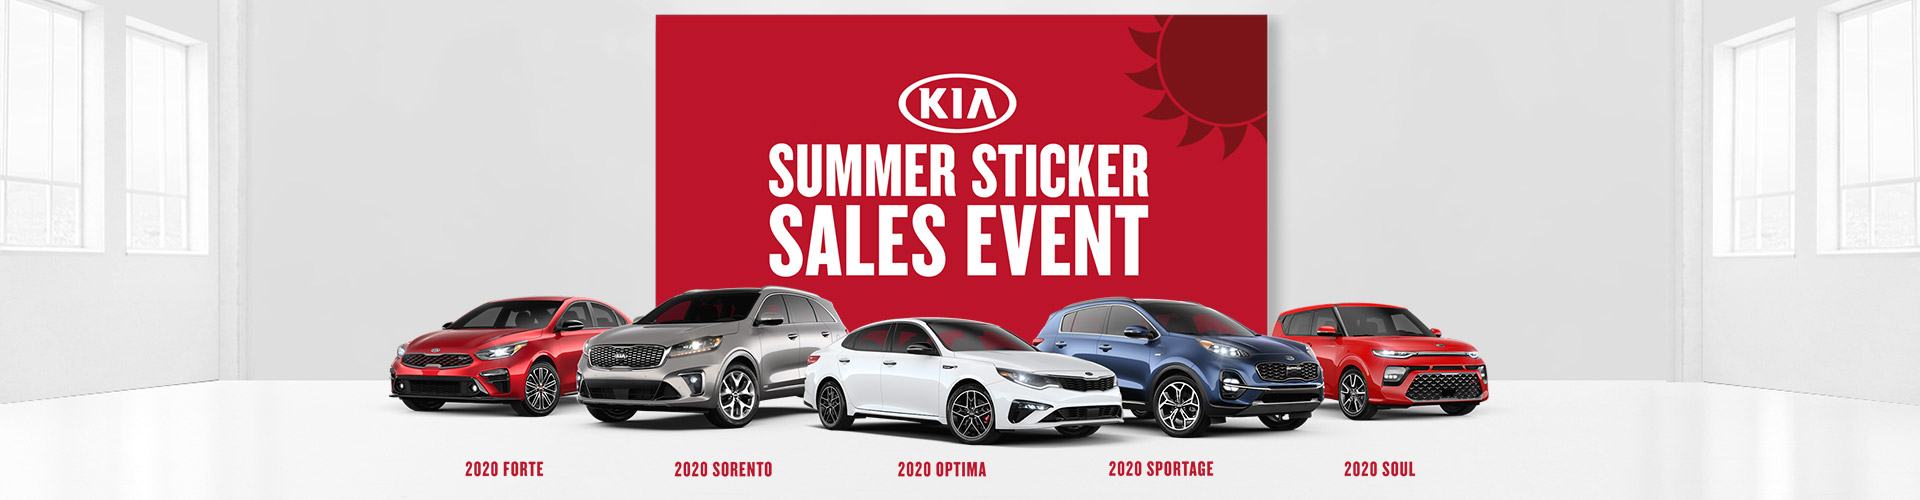 Summer Sticker Sales Event at Anderson Kia